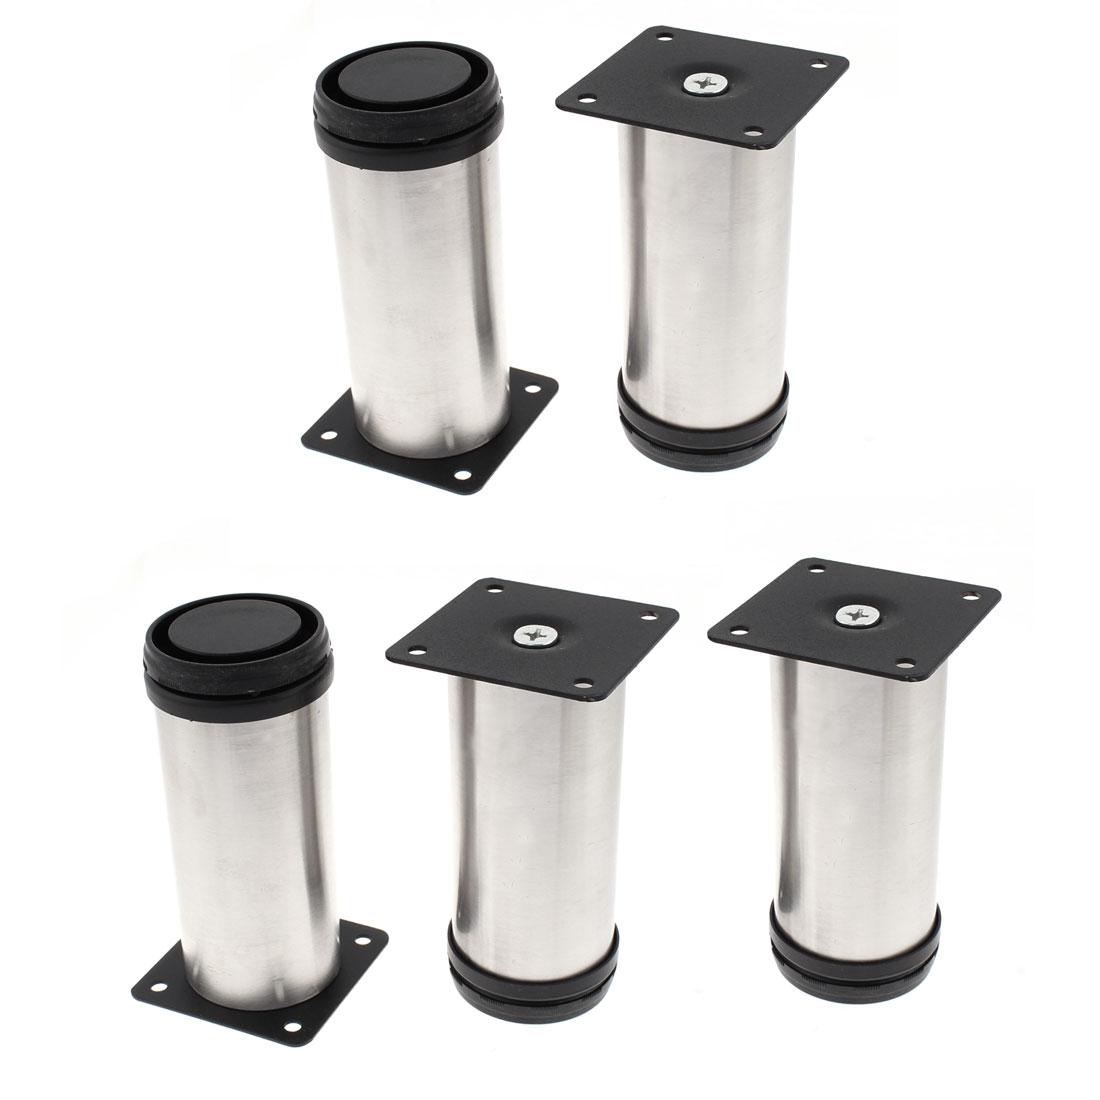 5pcs 50 x 120mm Adjustable Plinth Leg Feet for Kitchen Cabinet Sofa